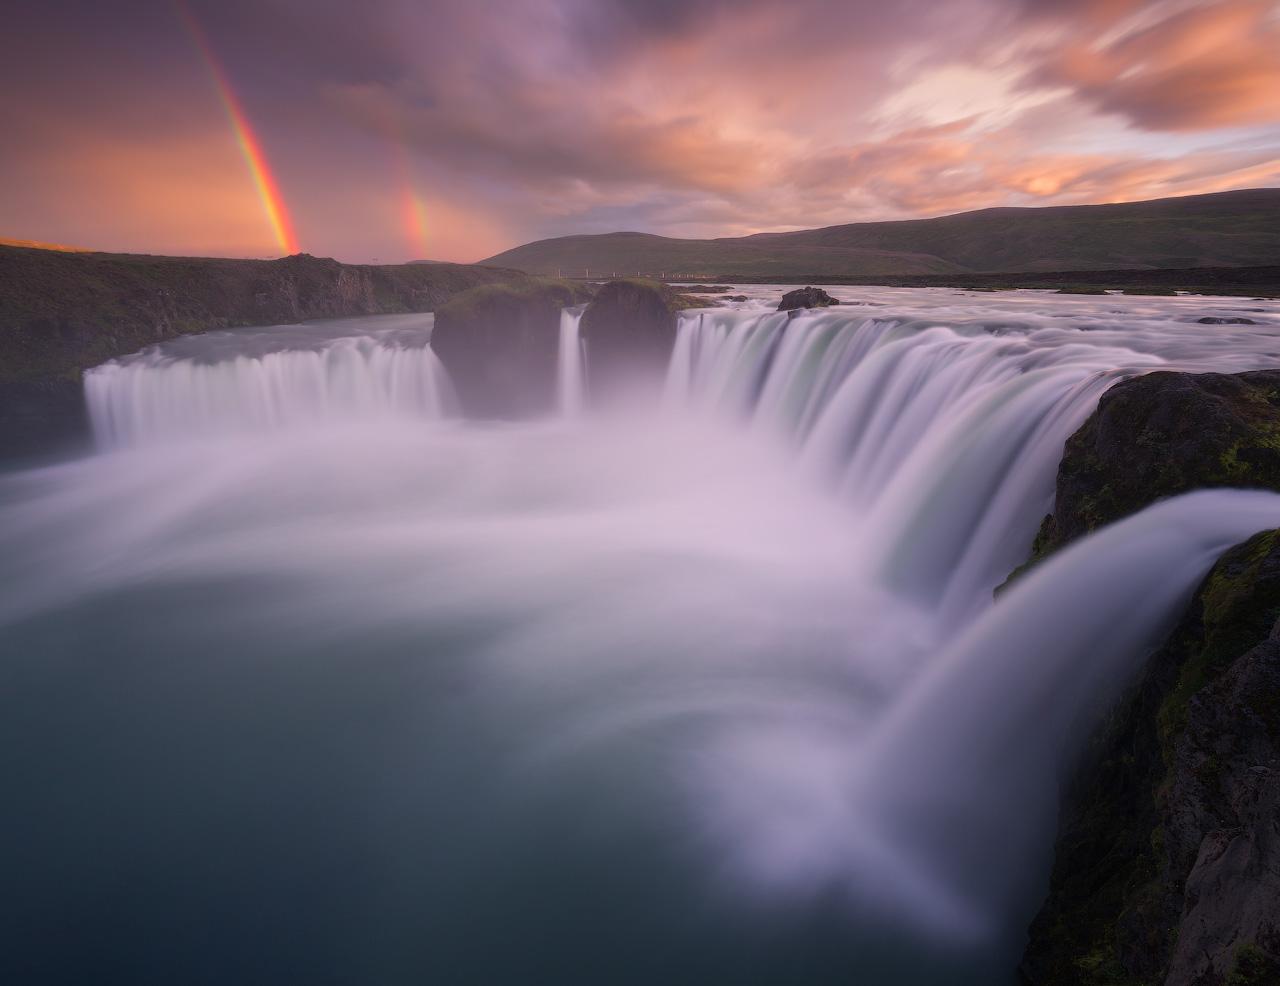 The mighty and beautiful waterfall Goðafoss thunders into the Skjálfandafljót river accompanied by a gorgeous rainbow.